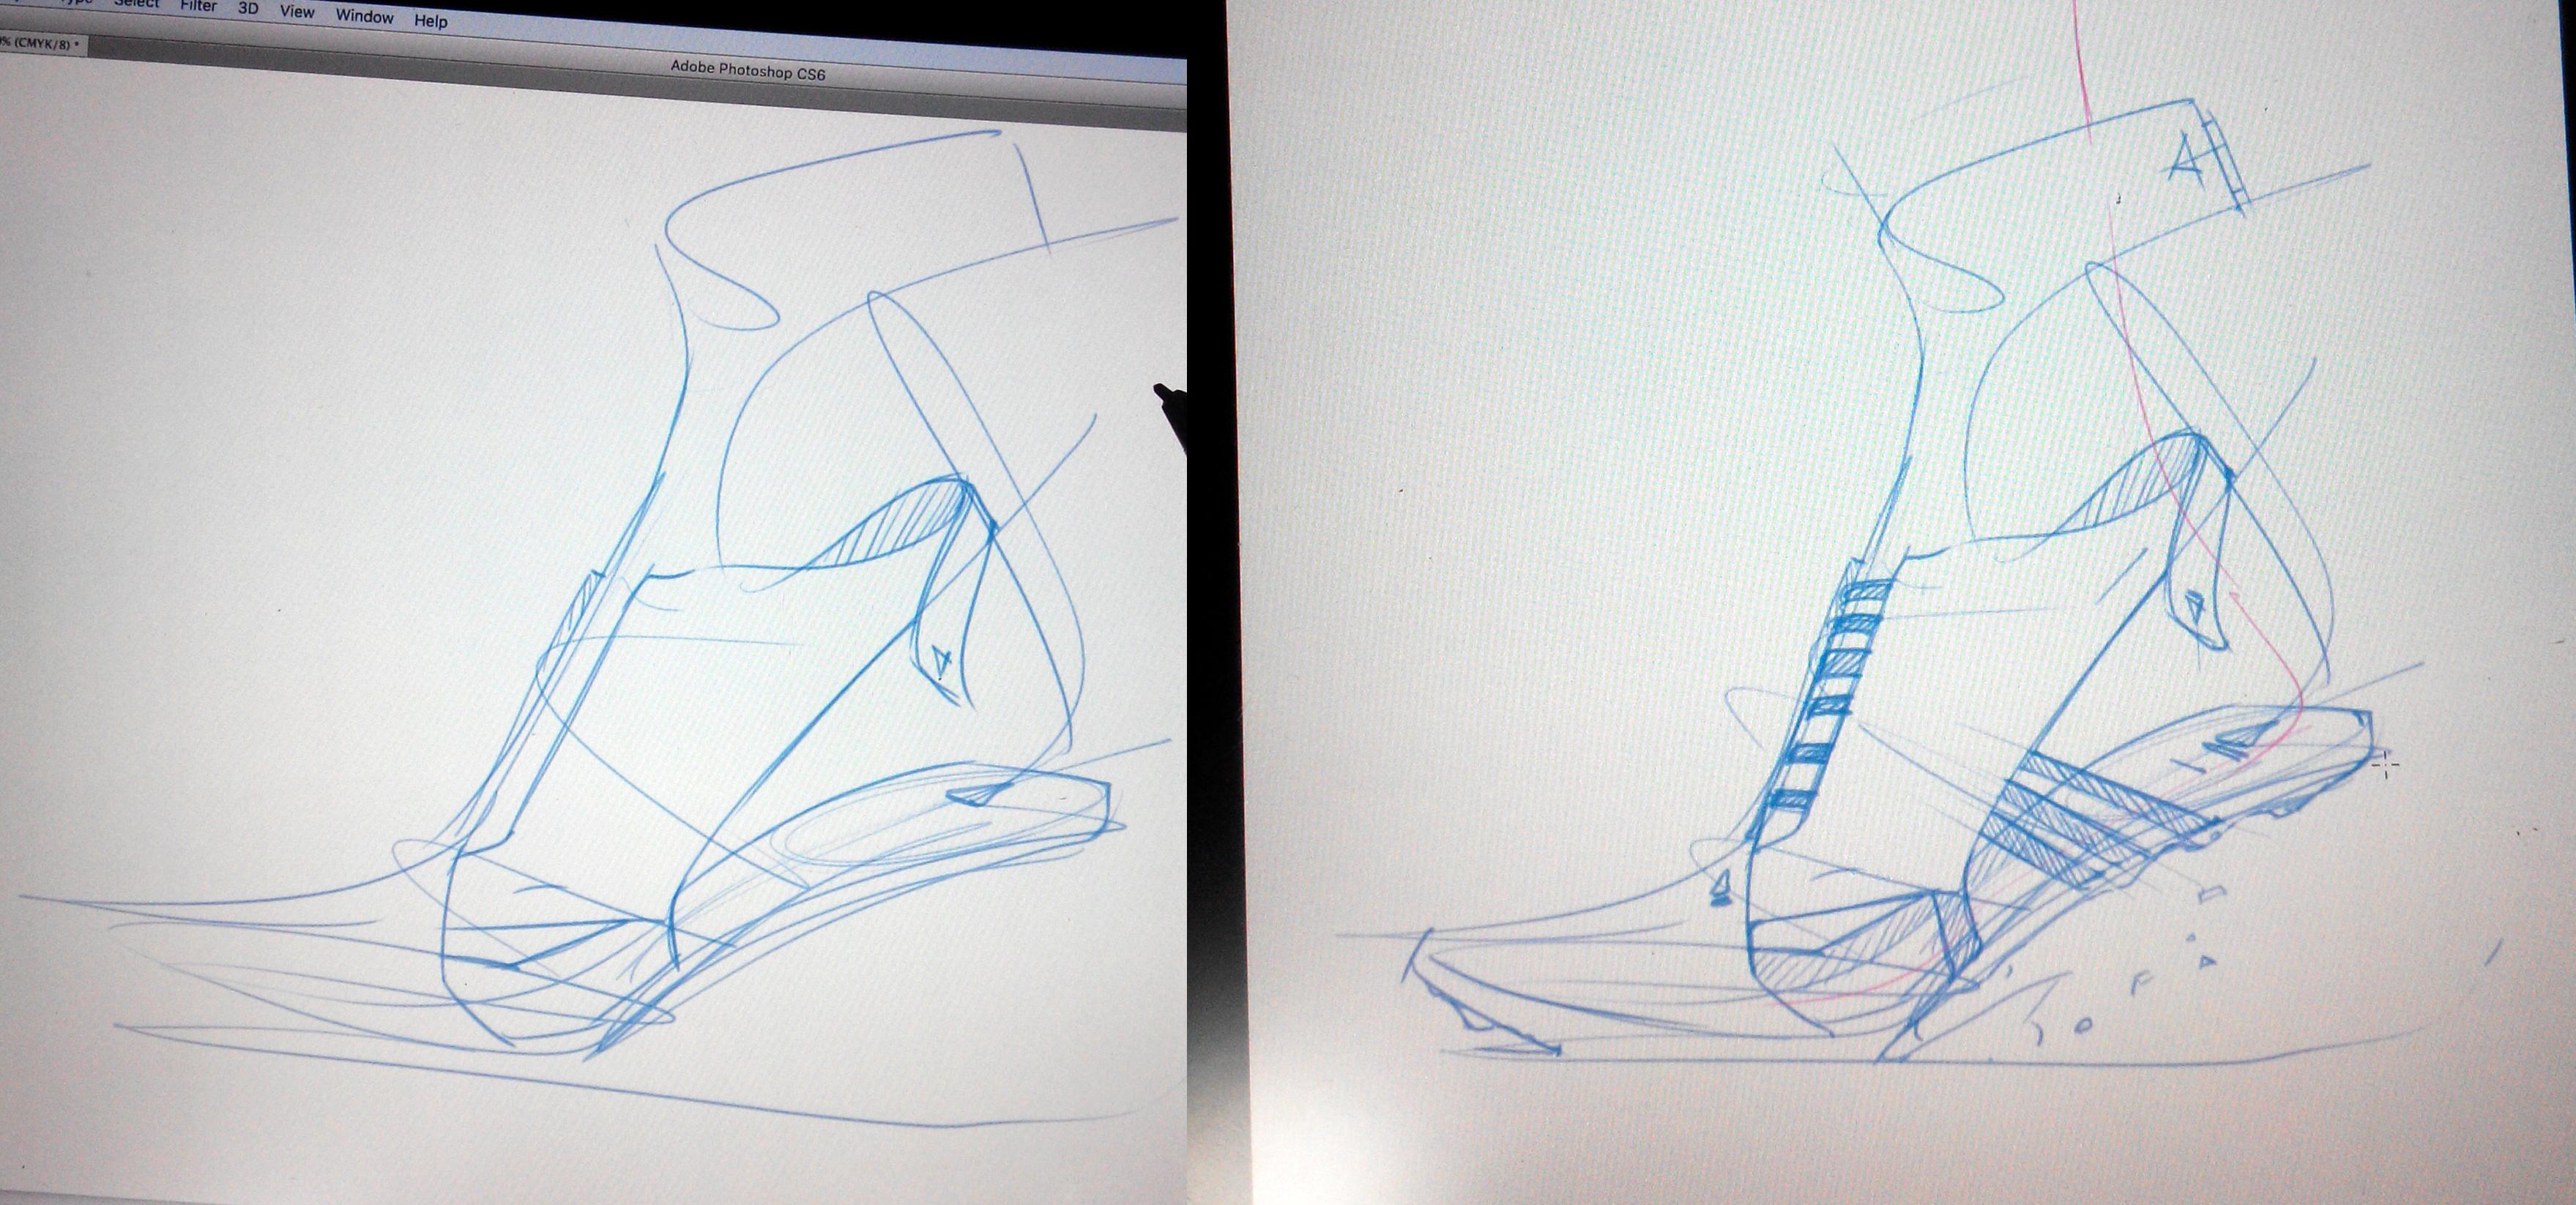 Adidas sketch sneaker 2 steps The Design Sketchbook Photoshop a copy